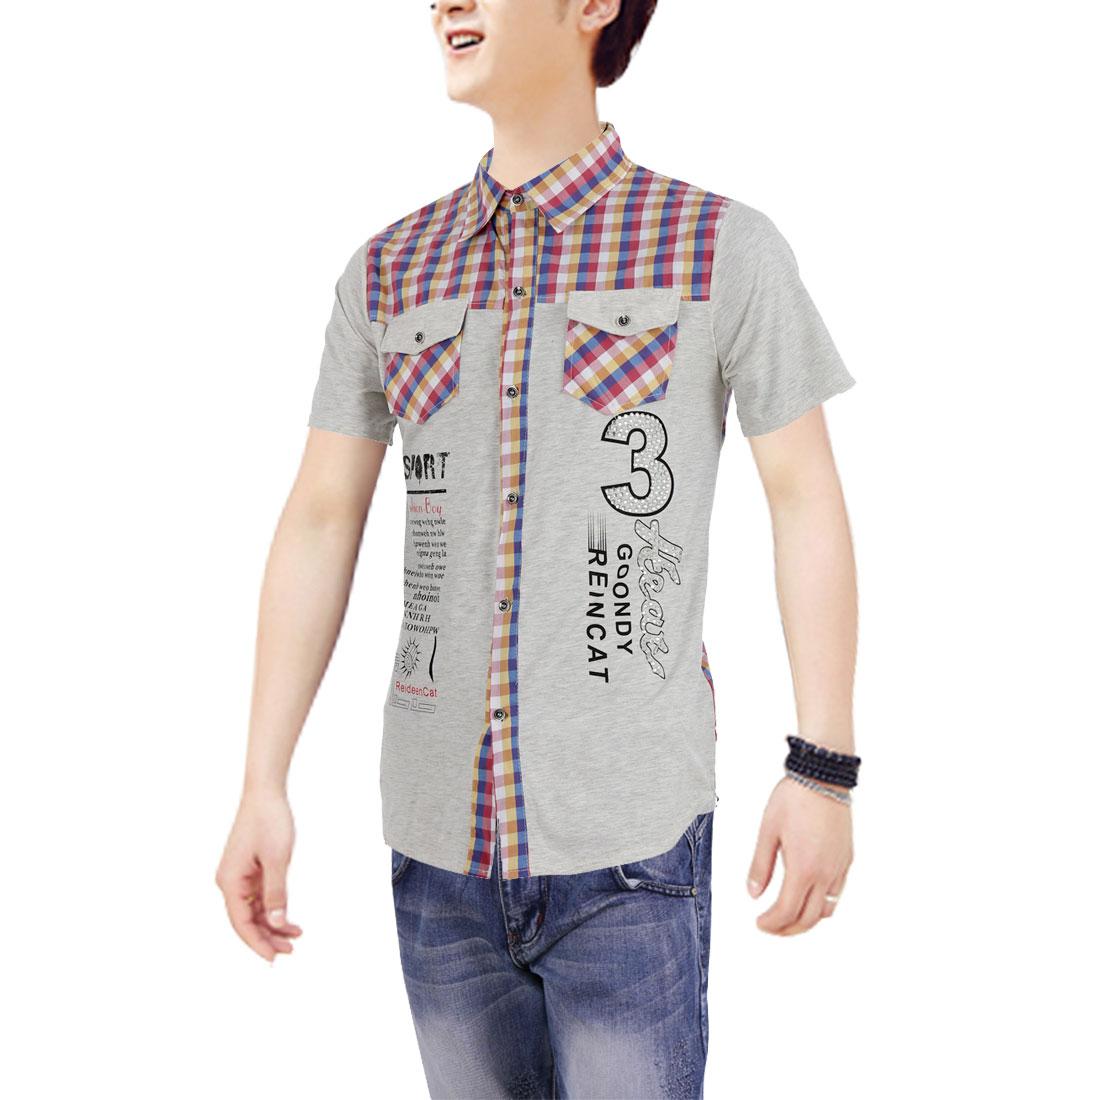 Men Button Up Short Sleeve Rhinestone Decor Shirt Yellow Light Gray M